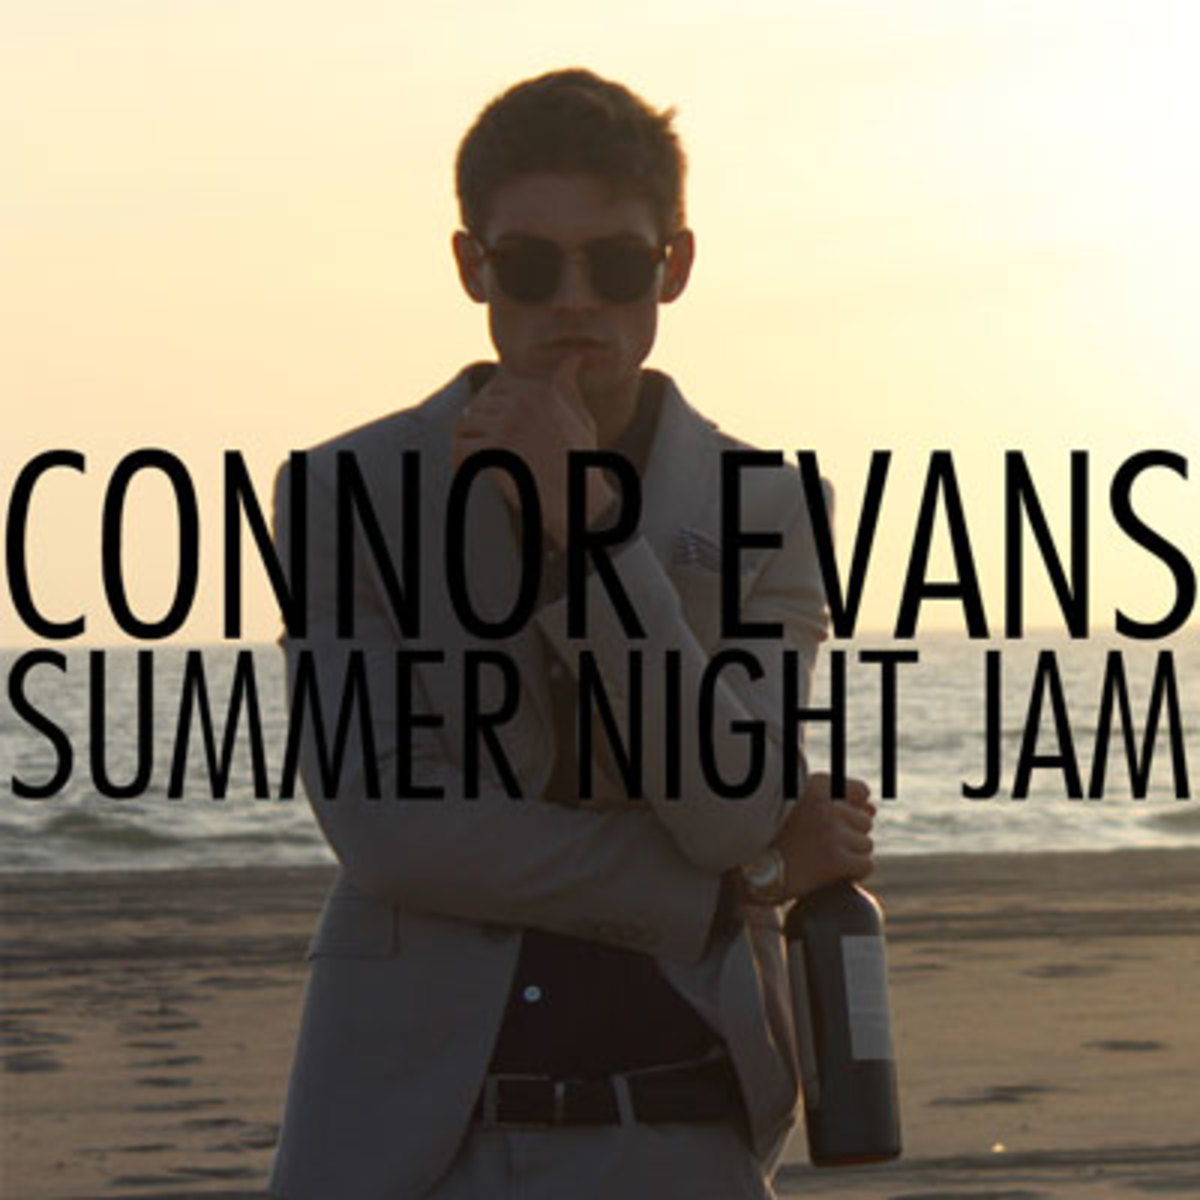 connorevans-summernightjam.jpg